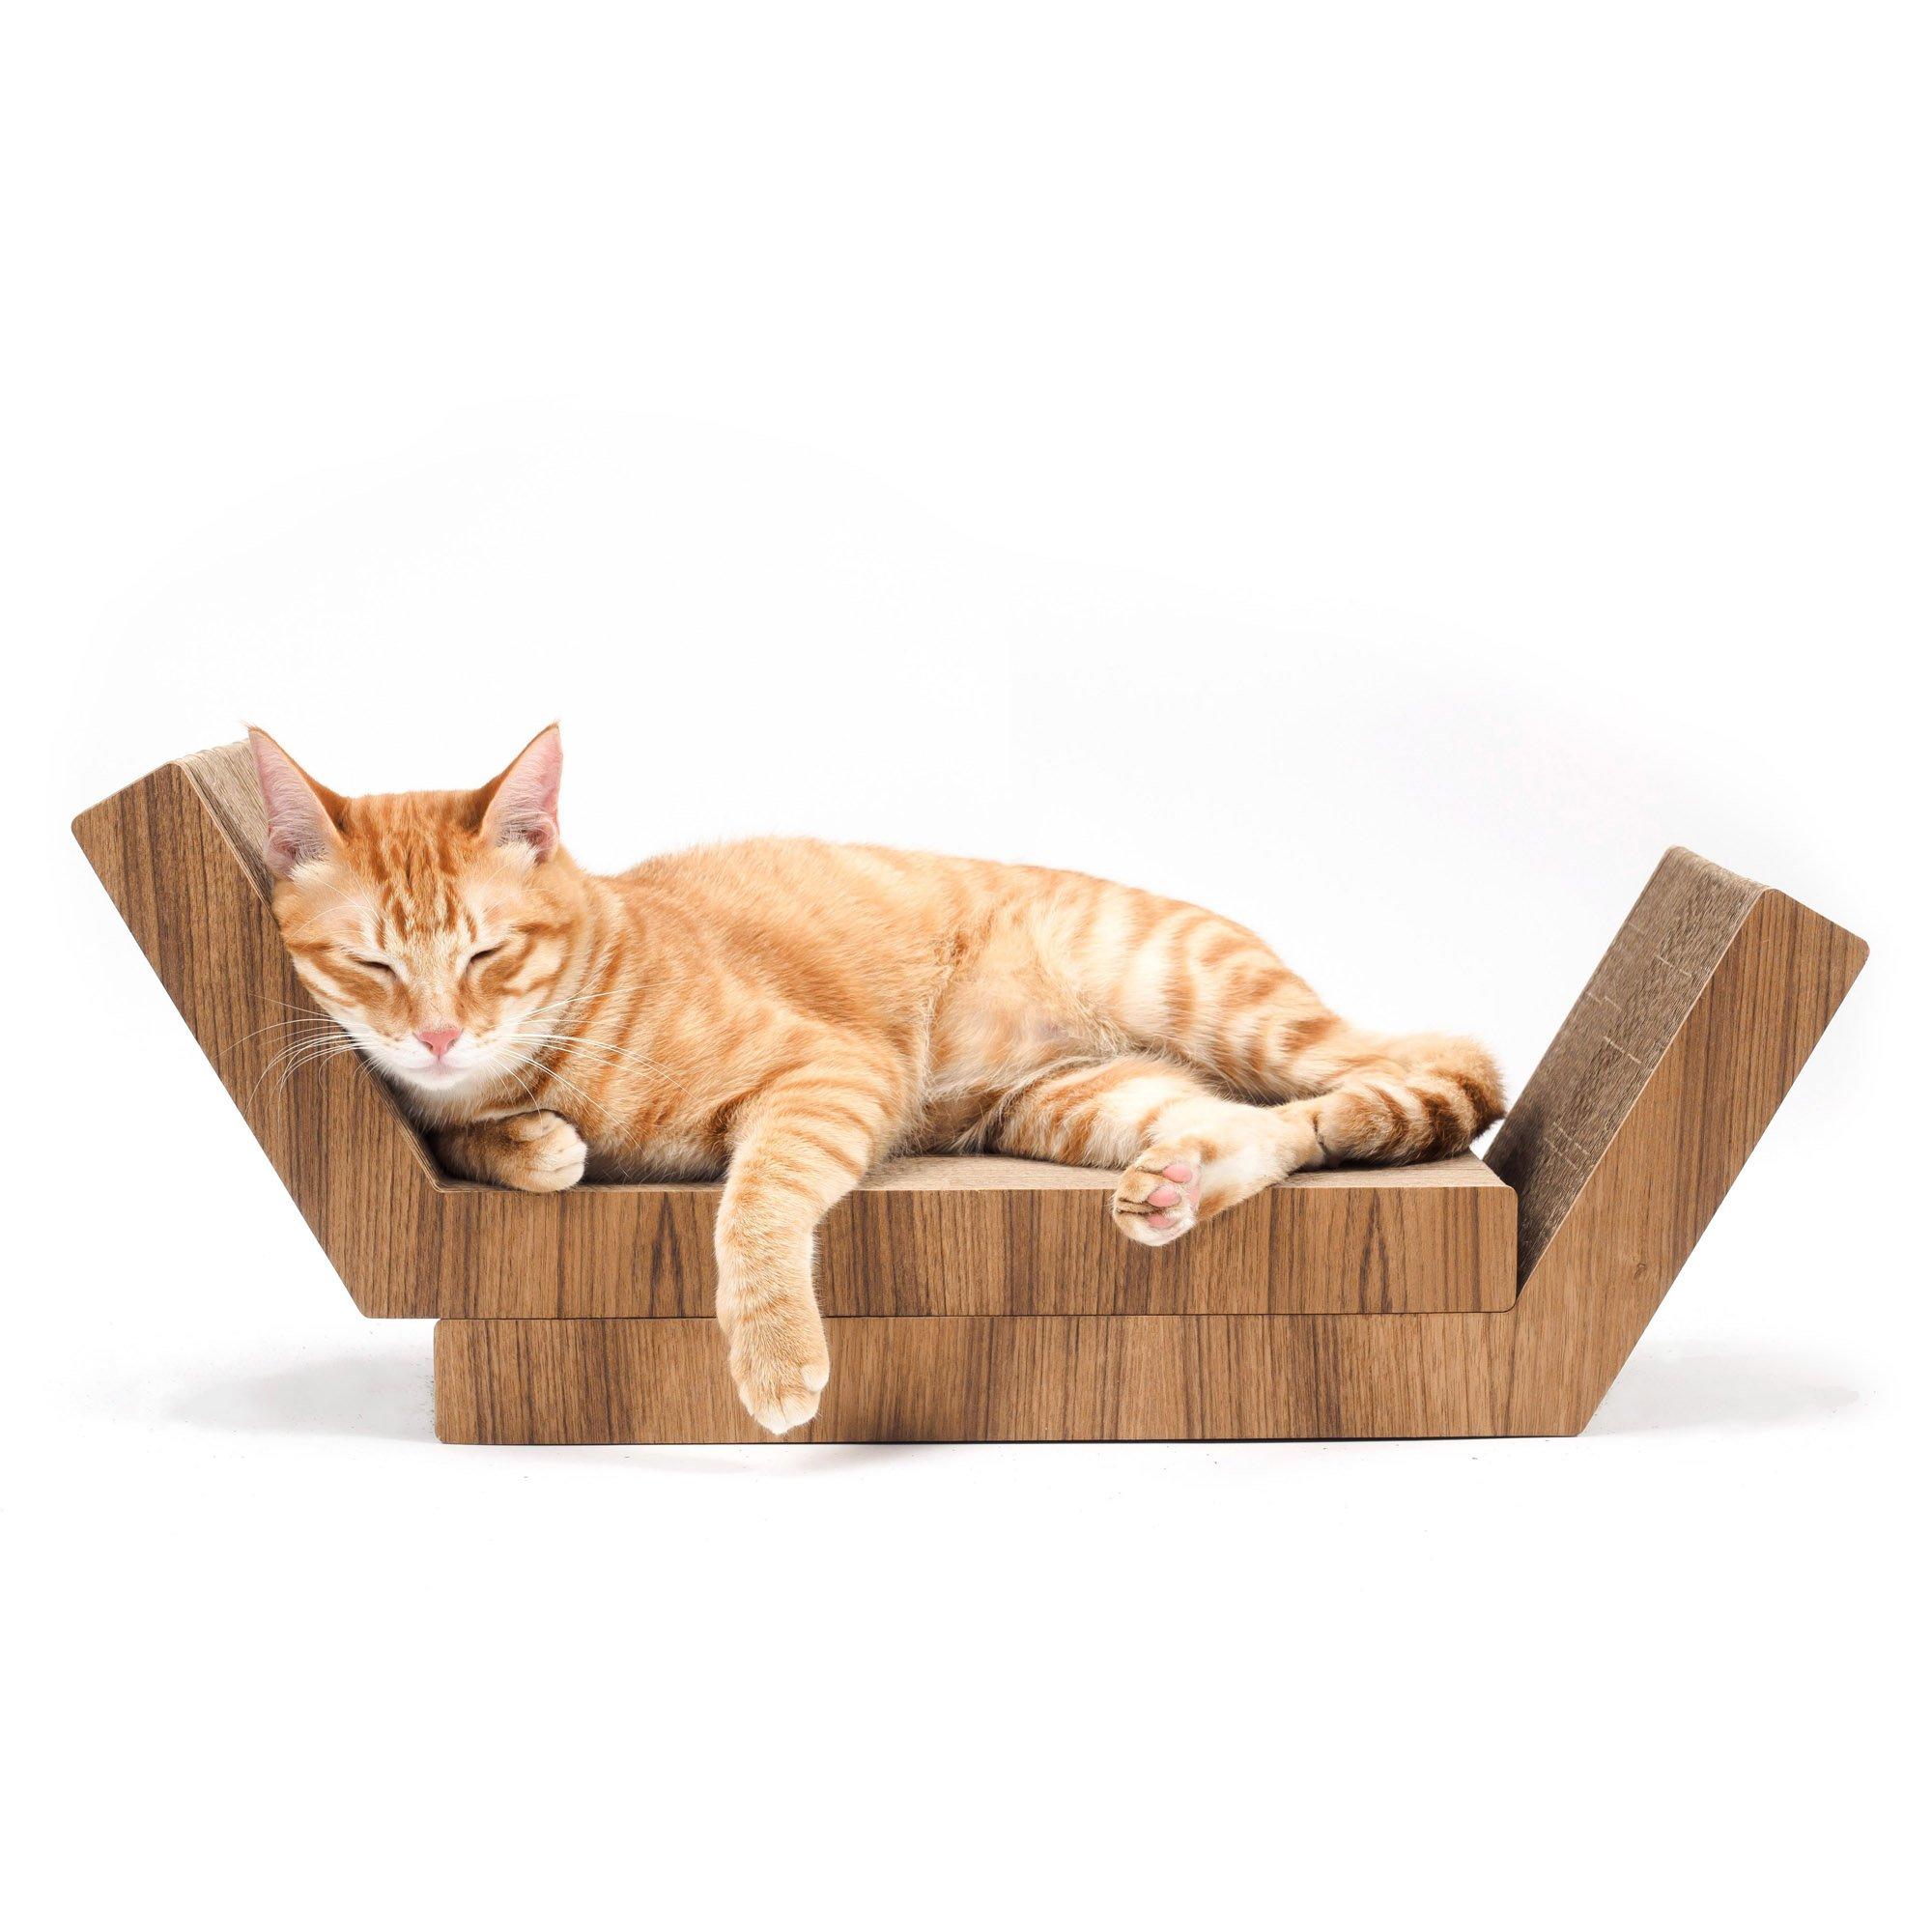 KATRIS Lynks Modular Cat Scratcher - 2 Pack, Real Teak Wood Cover